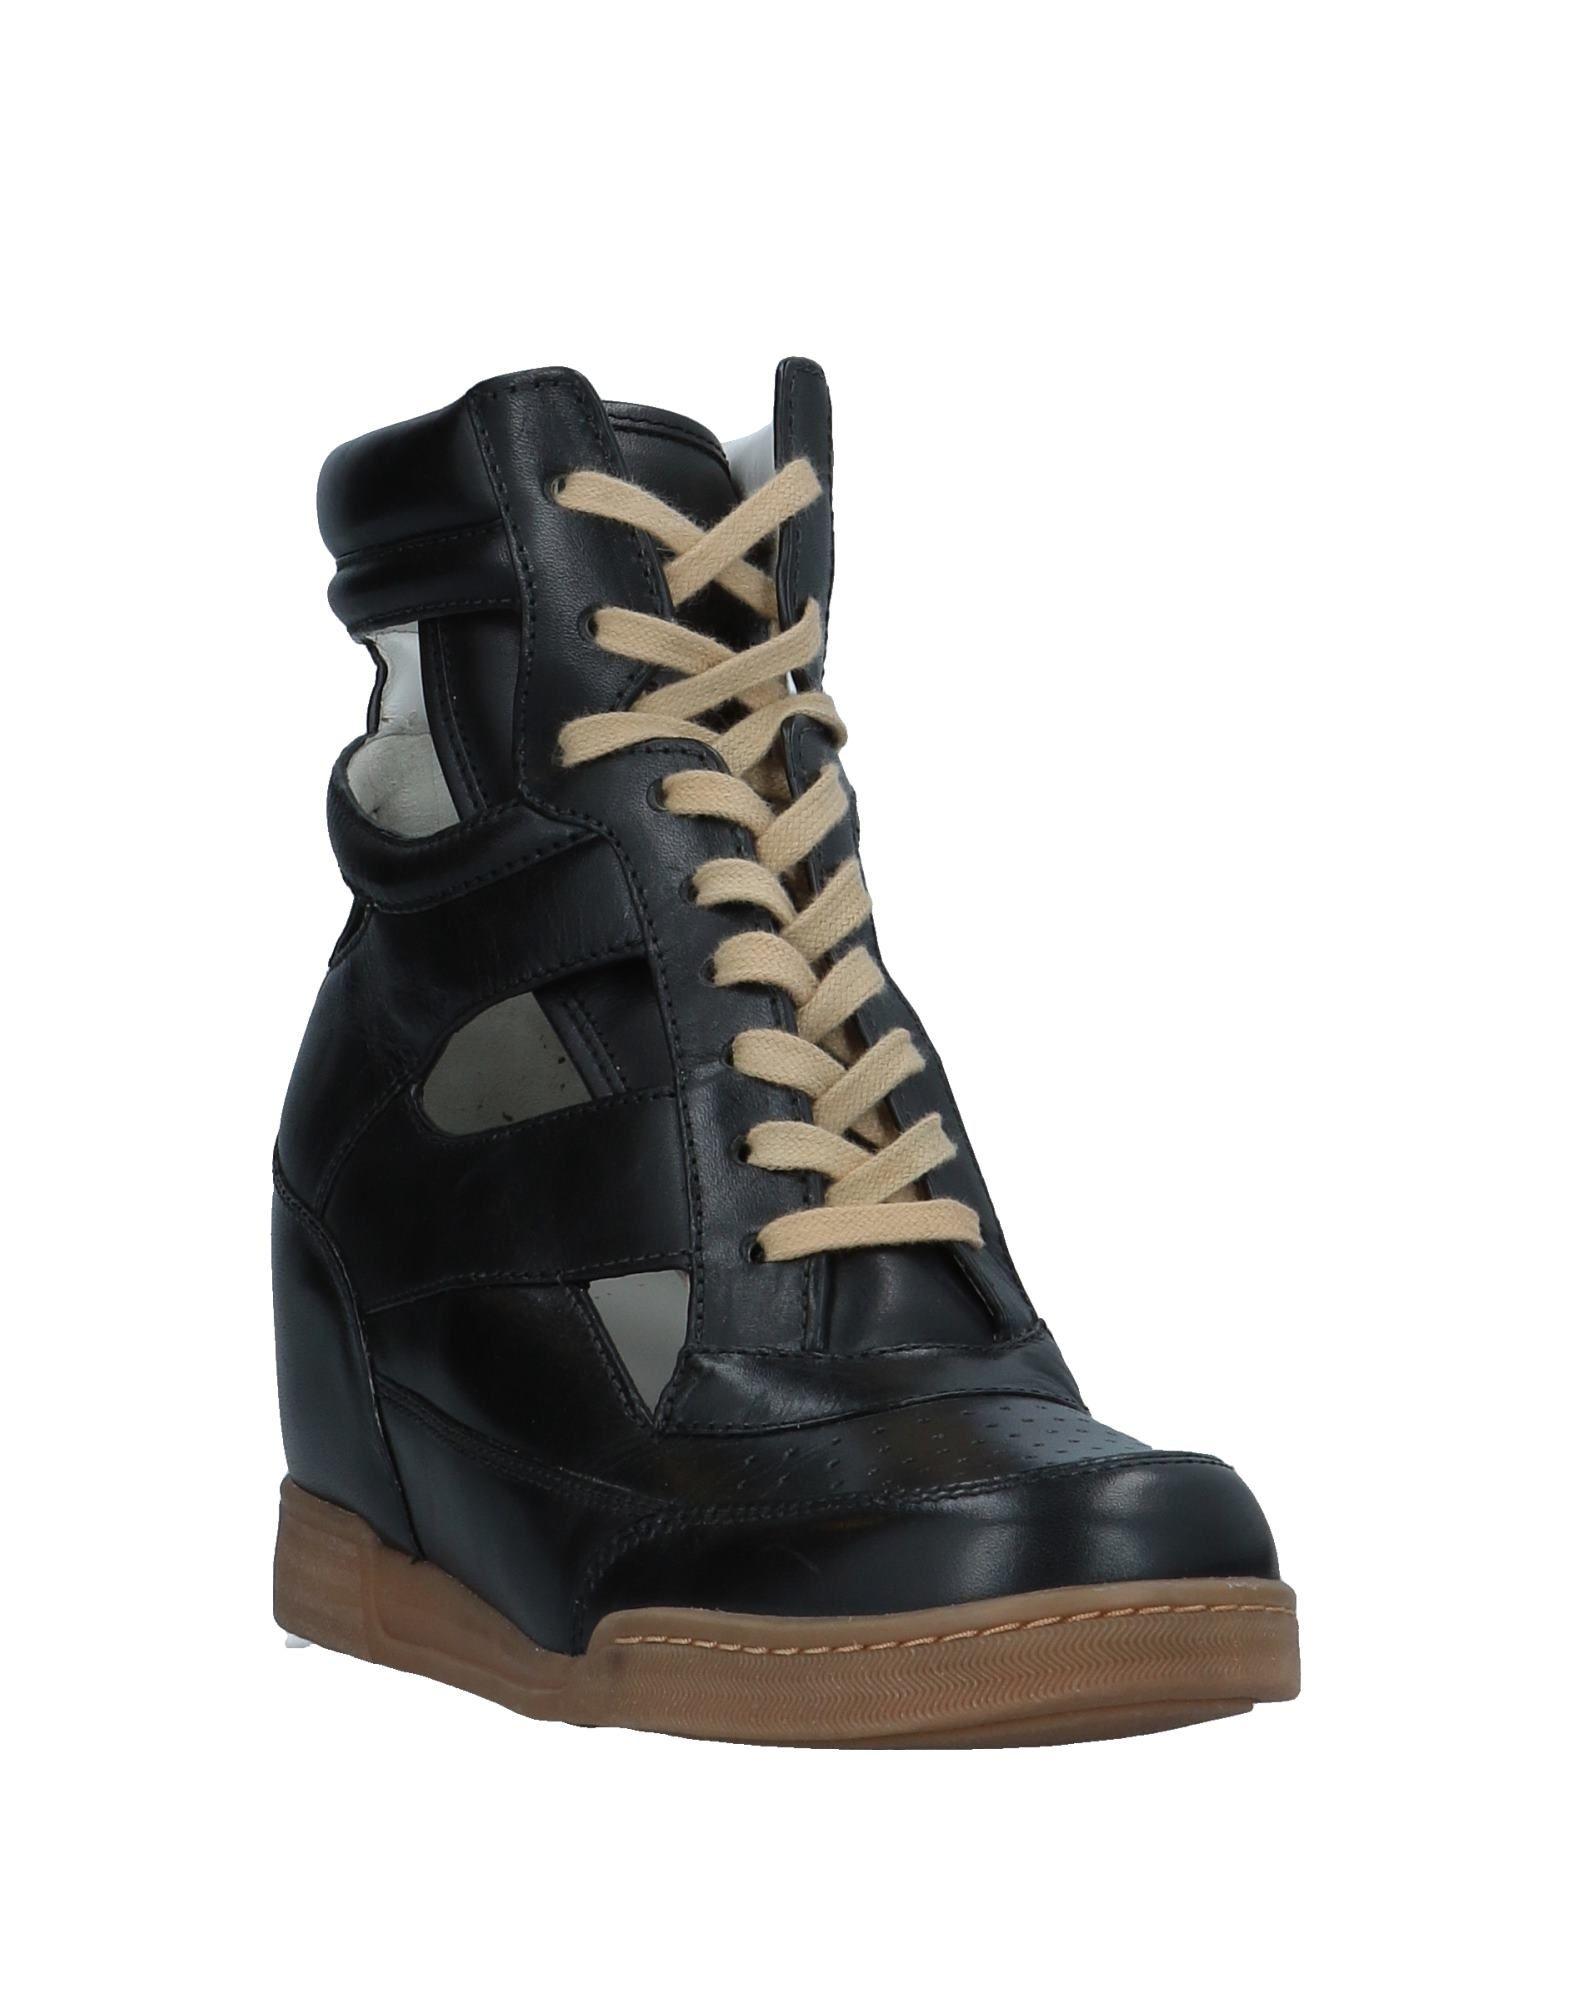 Marc Damen By Marc Jacobs Sneakers Damen Marc  11194978SAGut aussehende strapazierfähige Schuhe 888e87